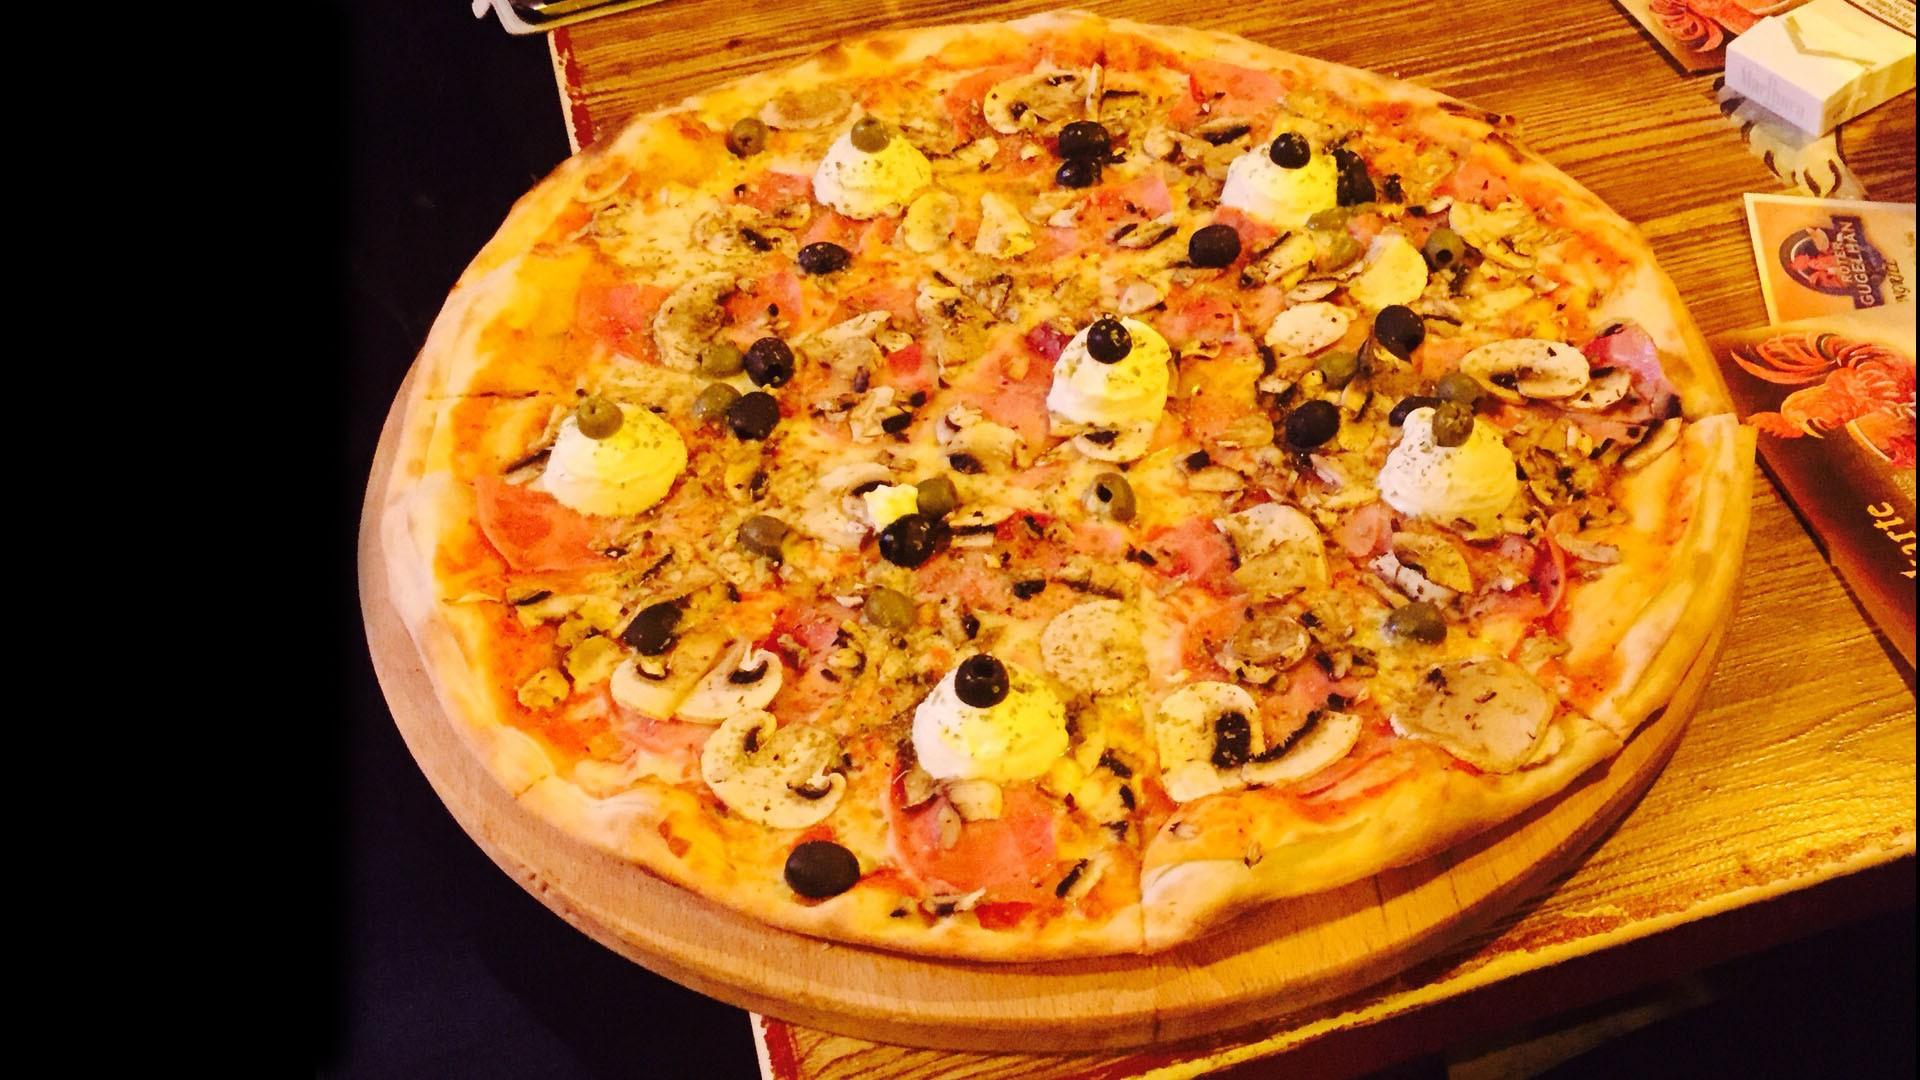 Leckere Pizza nach Originalrezept - aus dem Holzofen - in der Pizzeria Roter Gugelhan